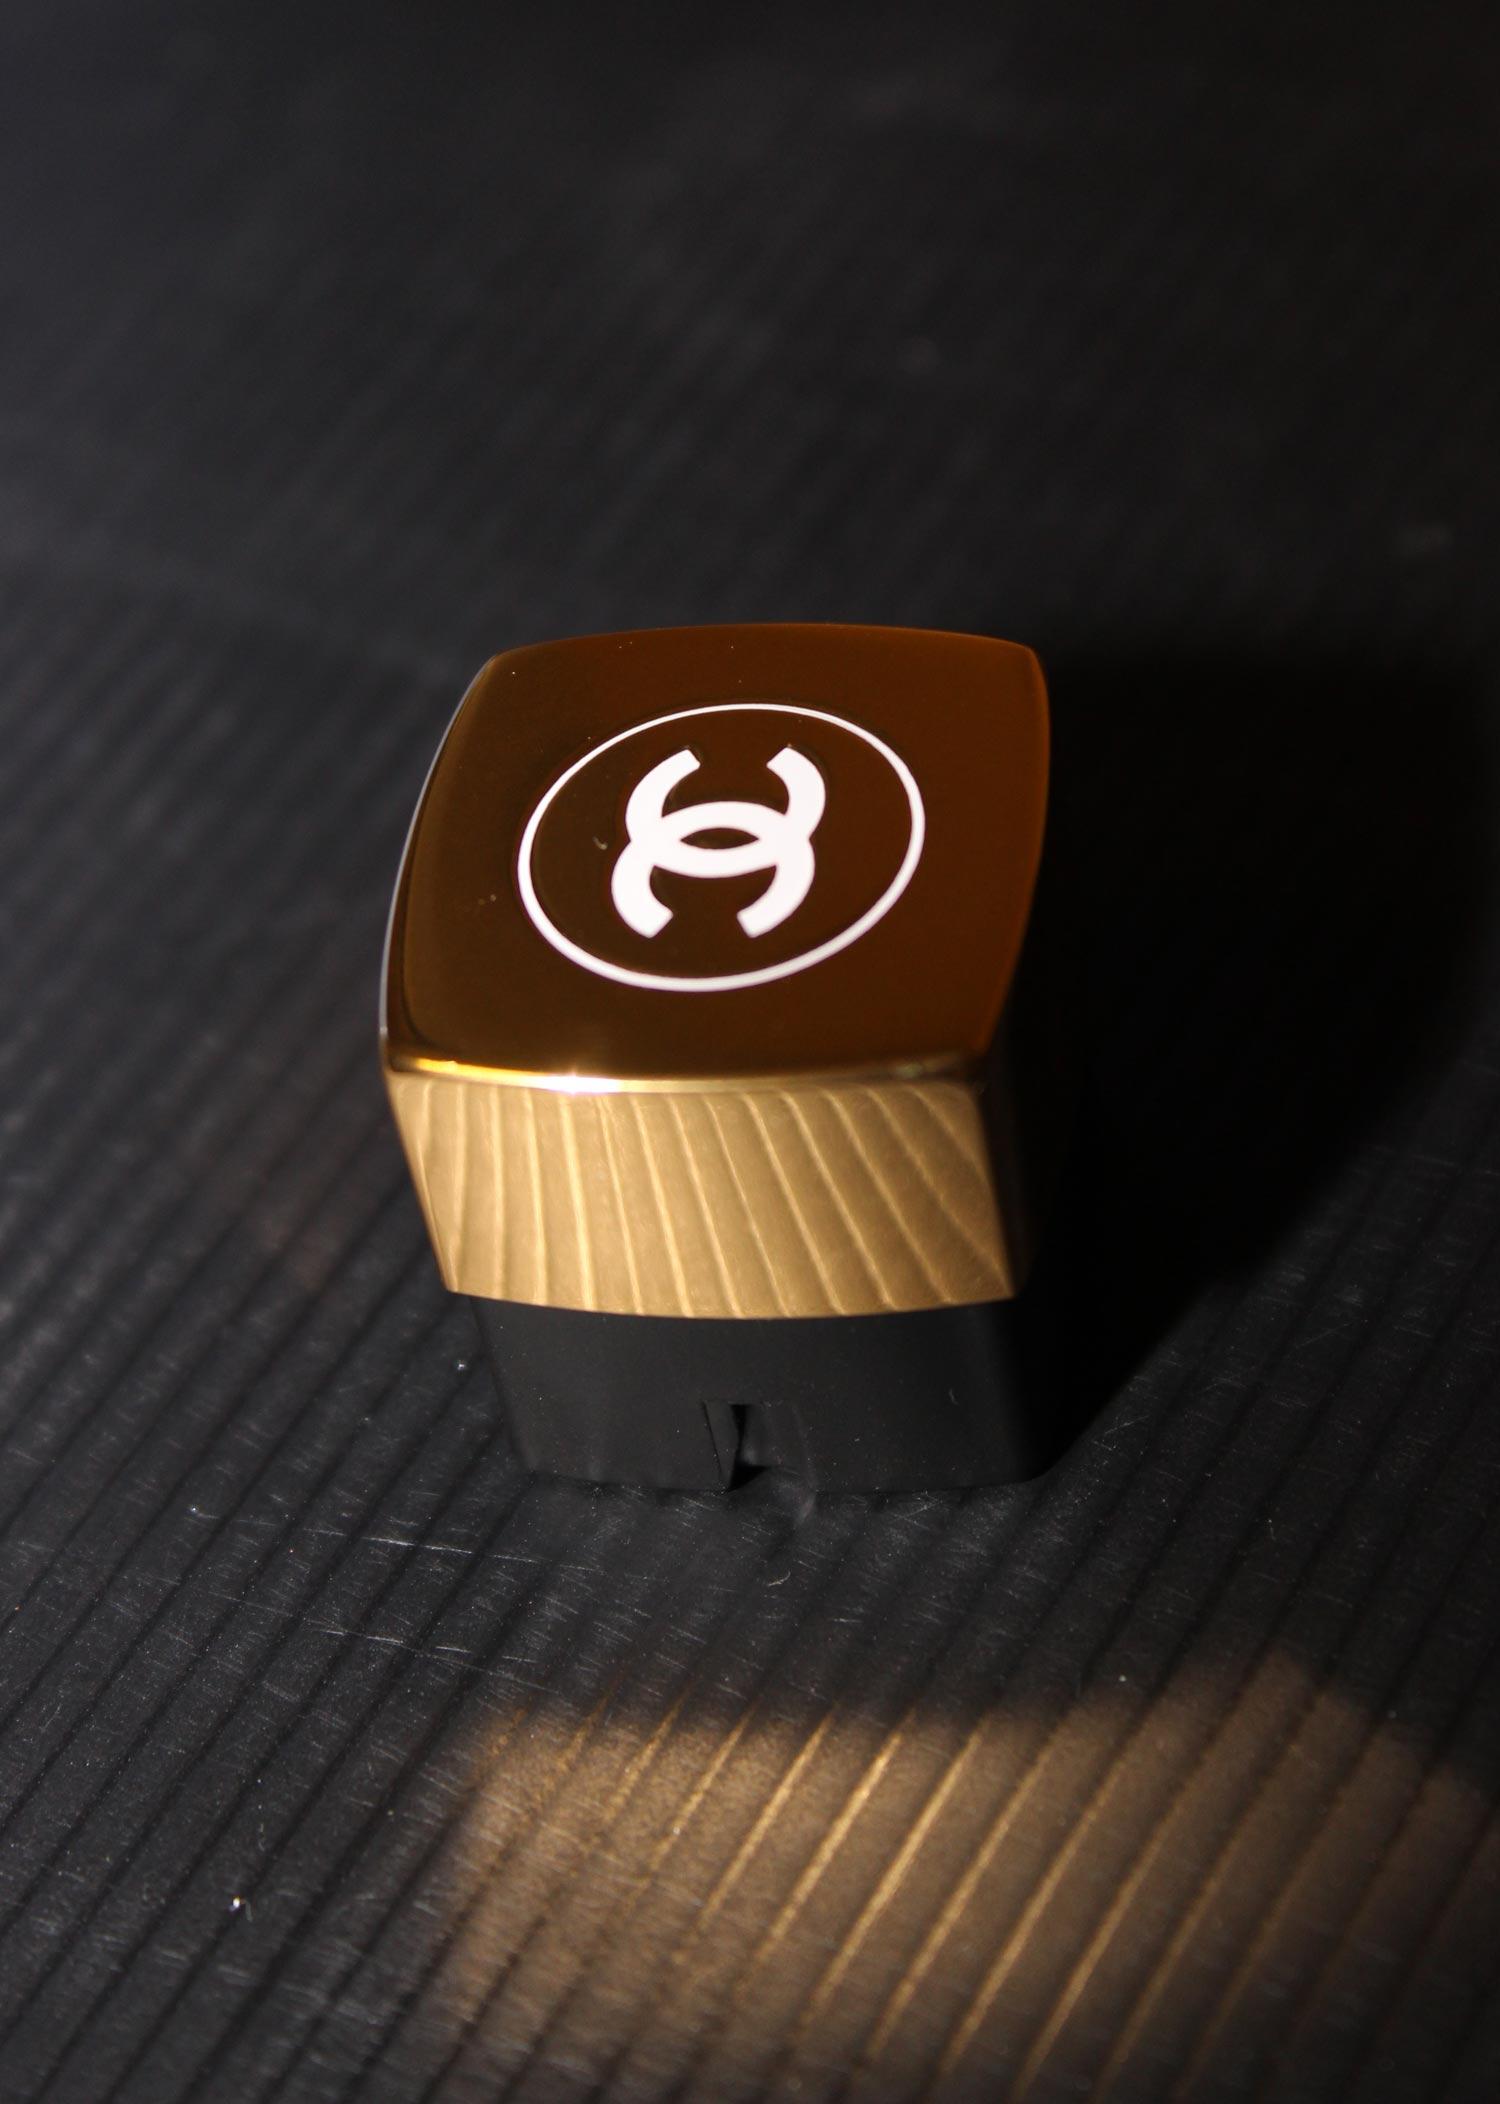 collage-bi-composant-bouton-poussoir-01